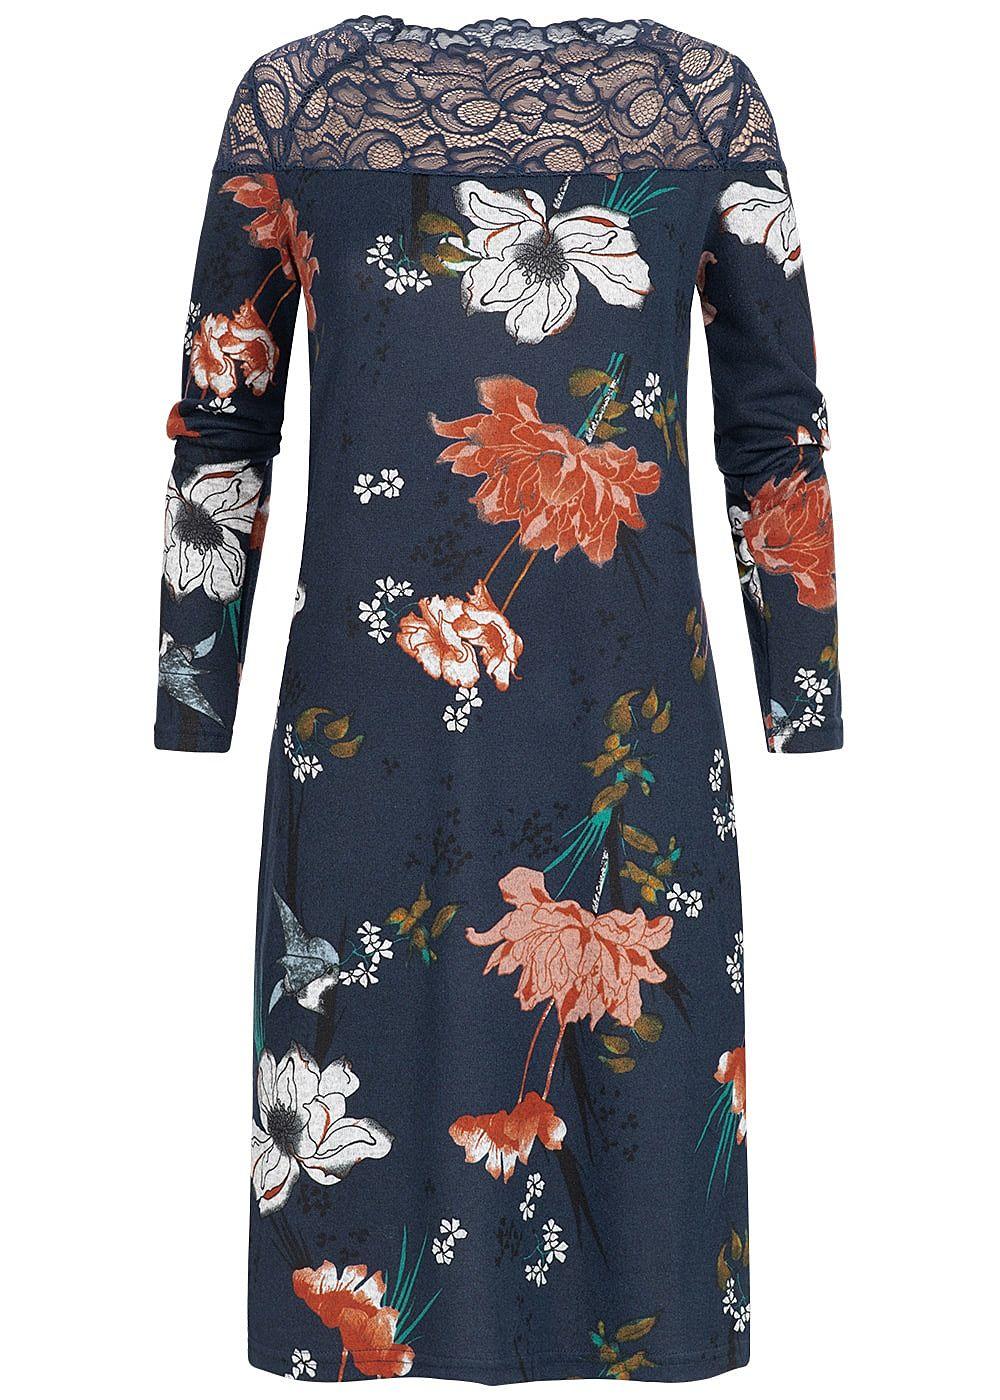 ONLY Damen Kleid Spitze oben Florales Muster night sky blau rot